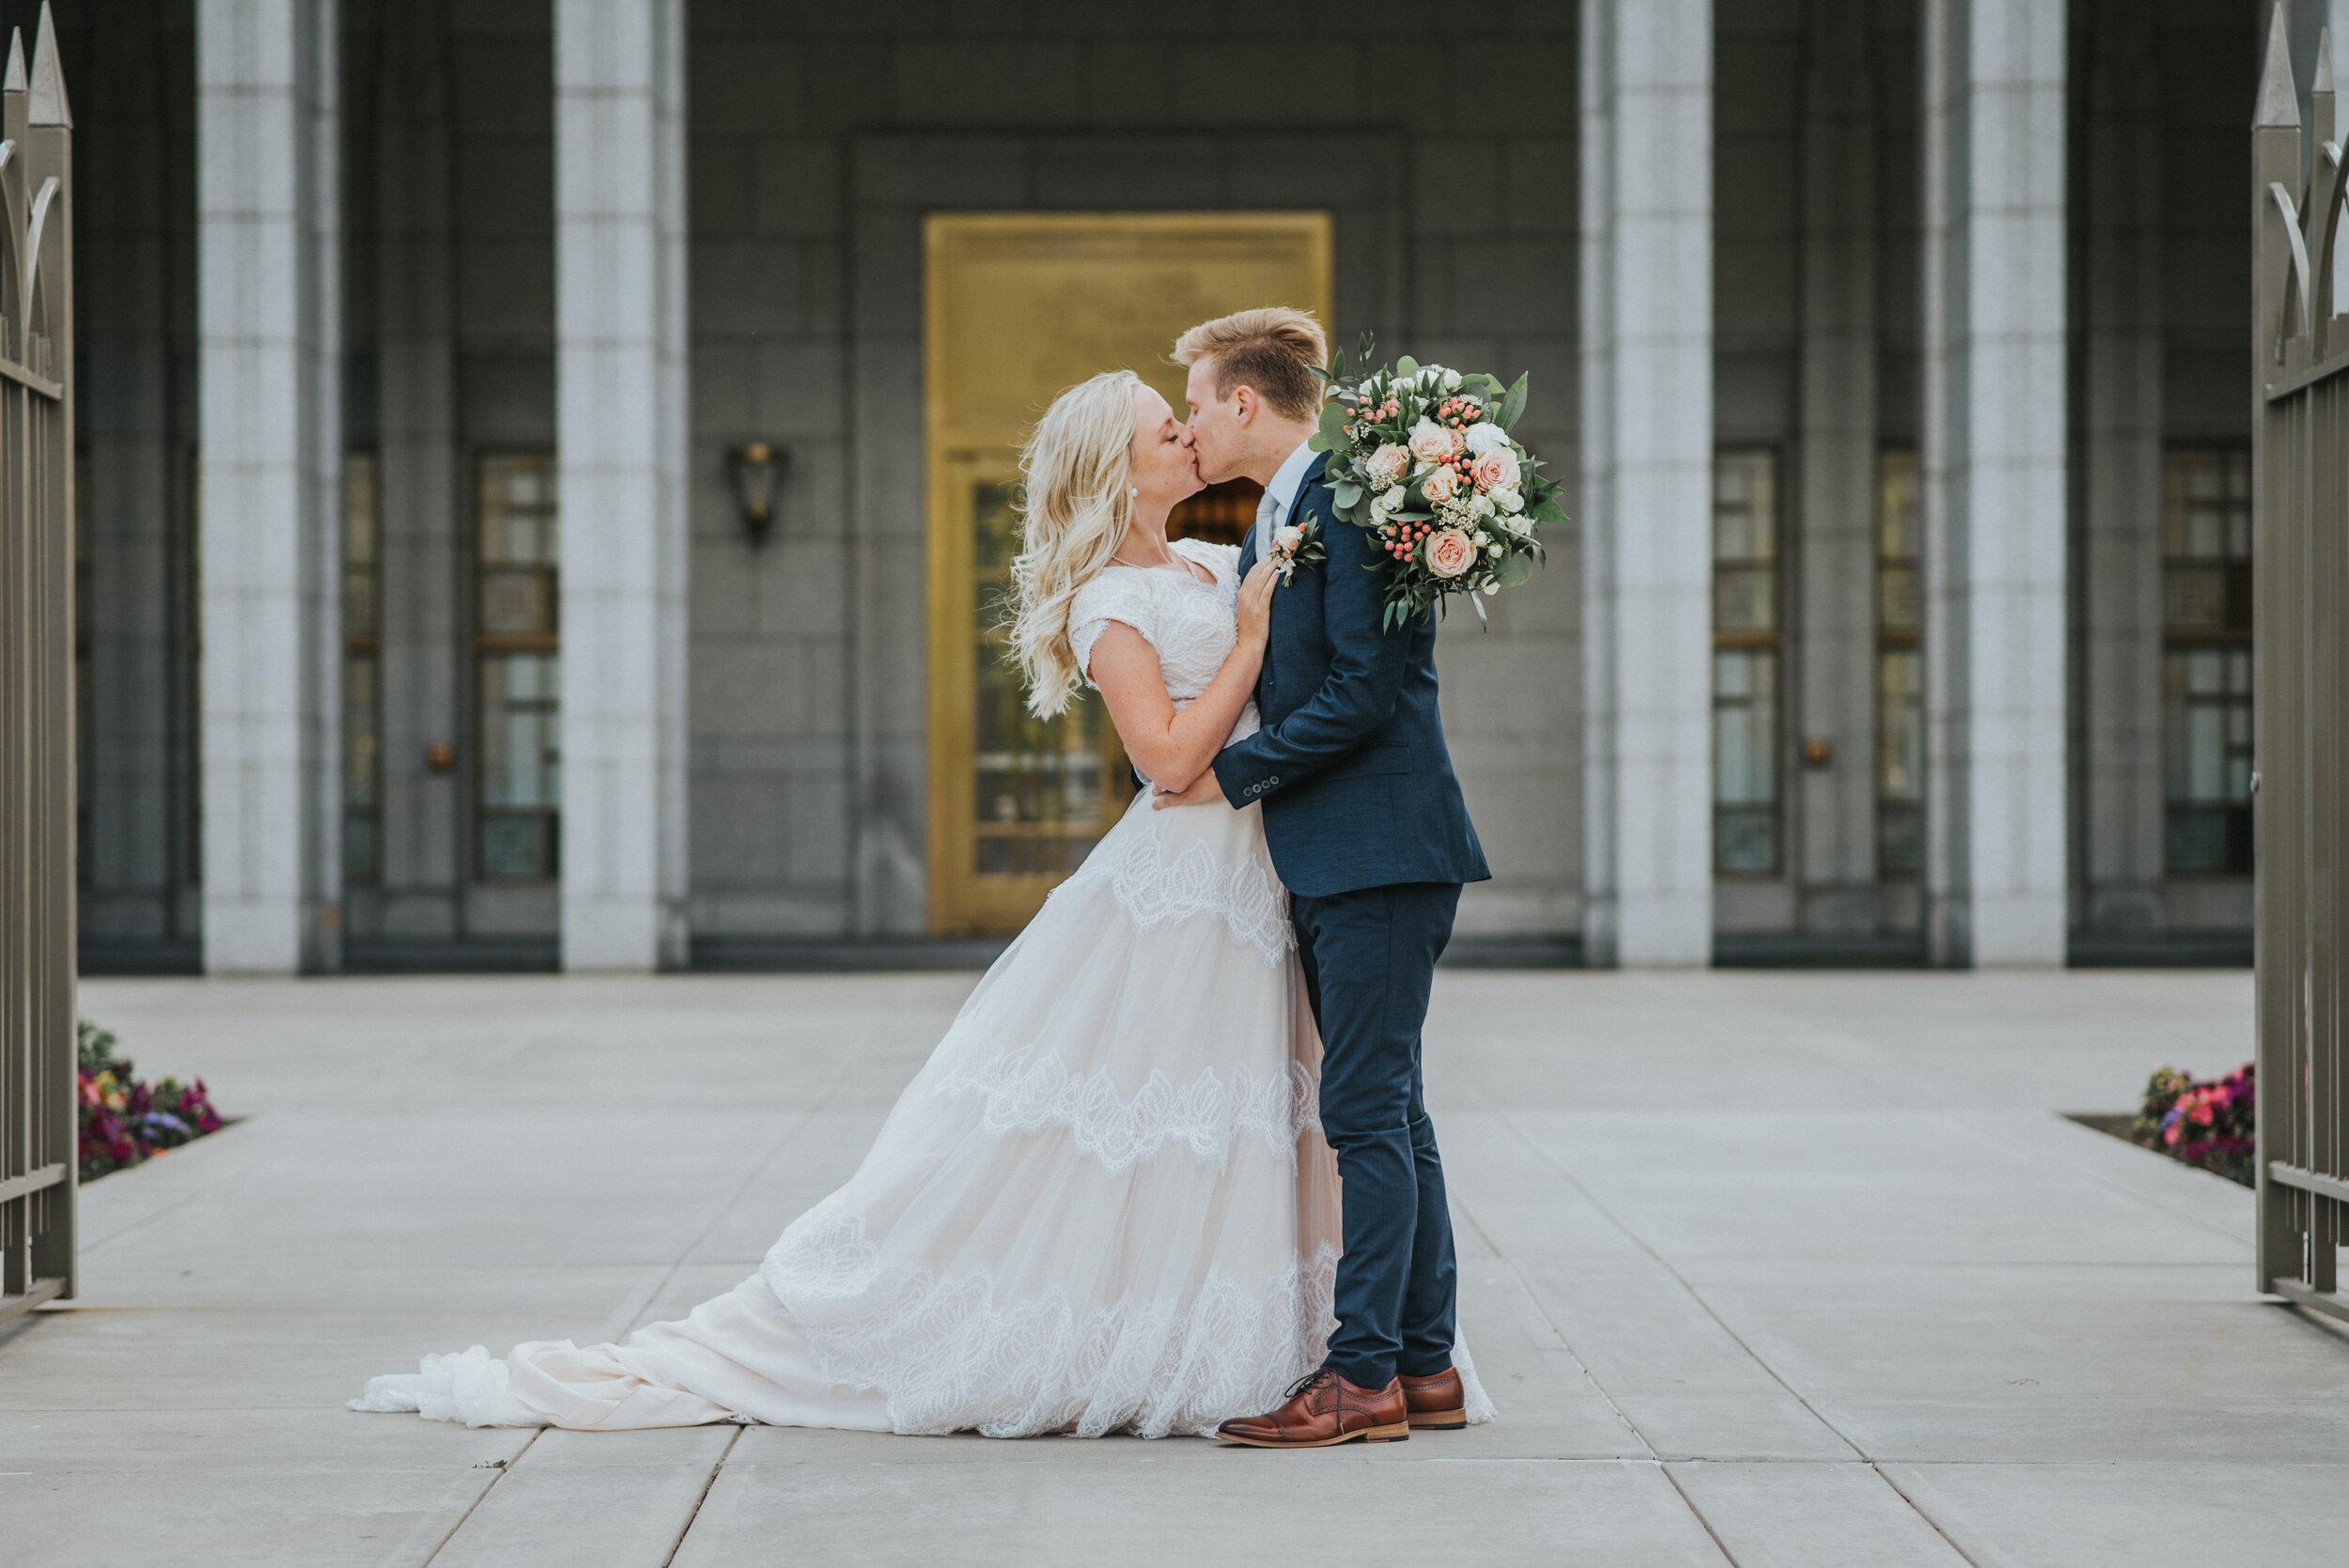 wedding_couple_embracing_draper_temple.jpeg